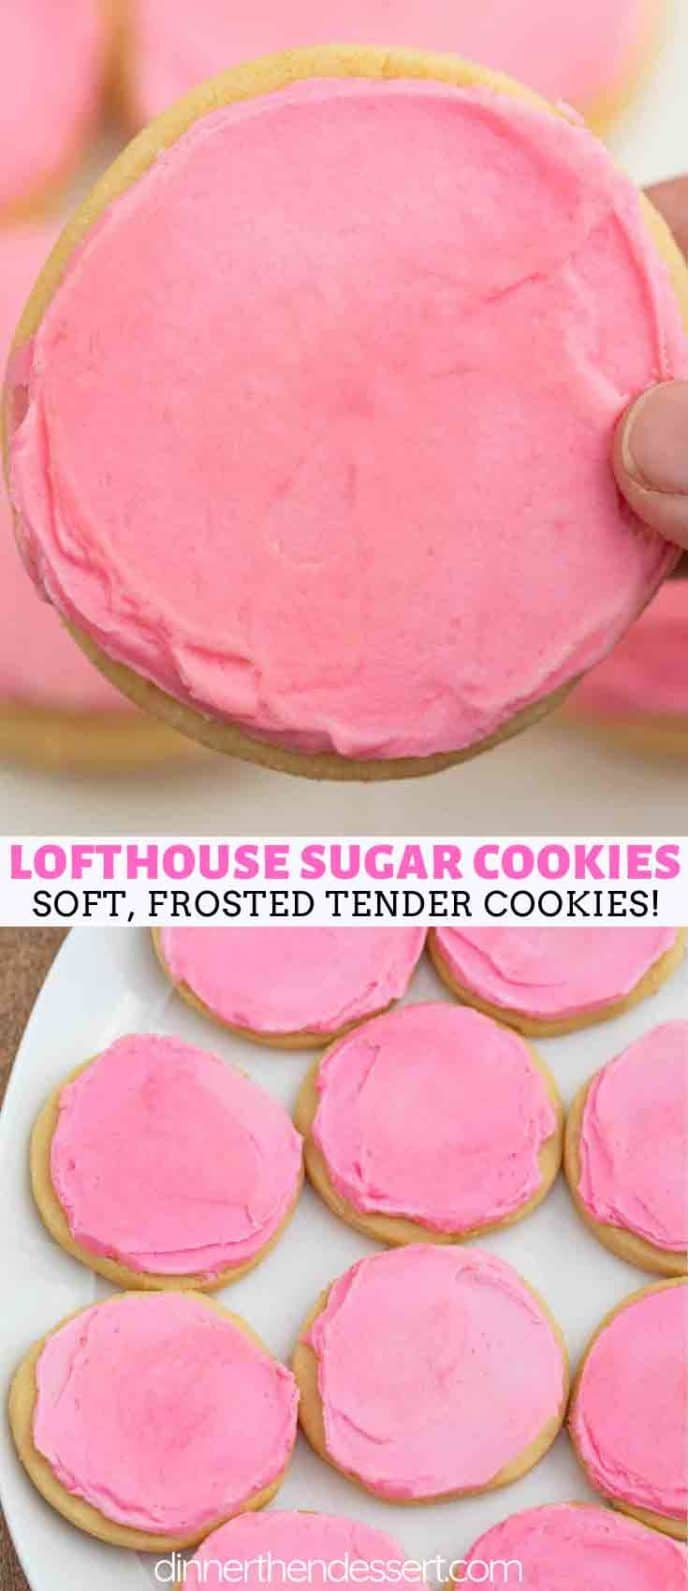 Grocery Store Copycat Lofthouse Sugar Cookies